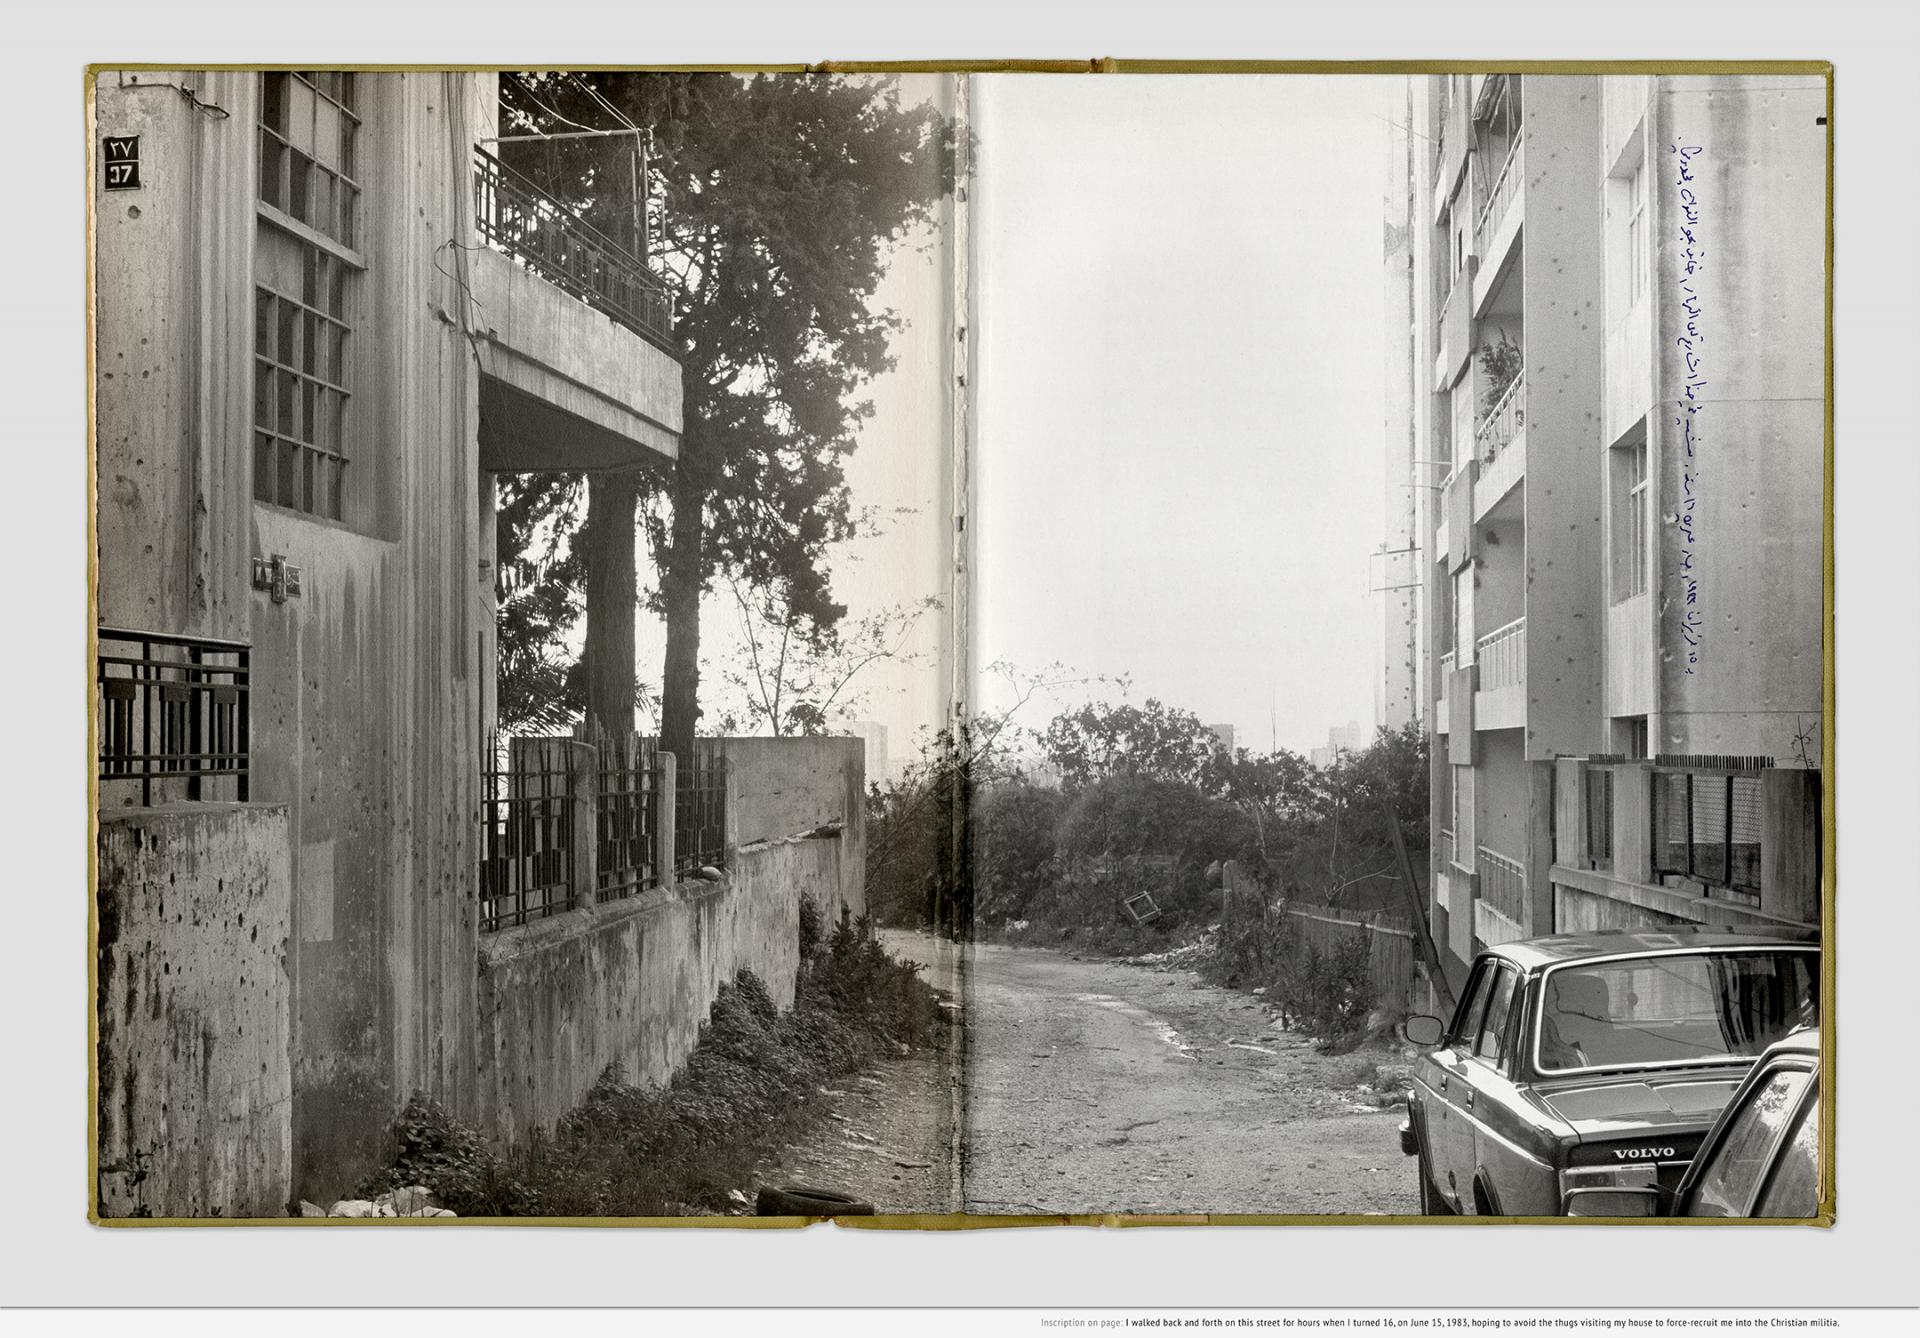 Sweet Talk. Commissions (Beirut) _ 1987.009, 1987-2019, inkjet print, 54.3 x 76.3 x 3.5cm, framed